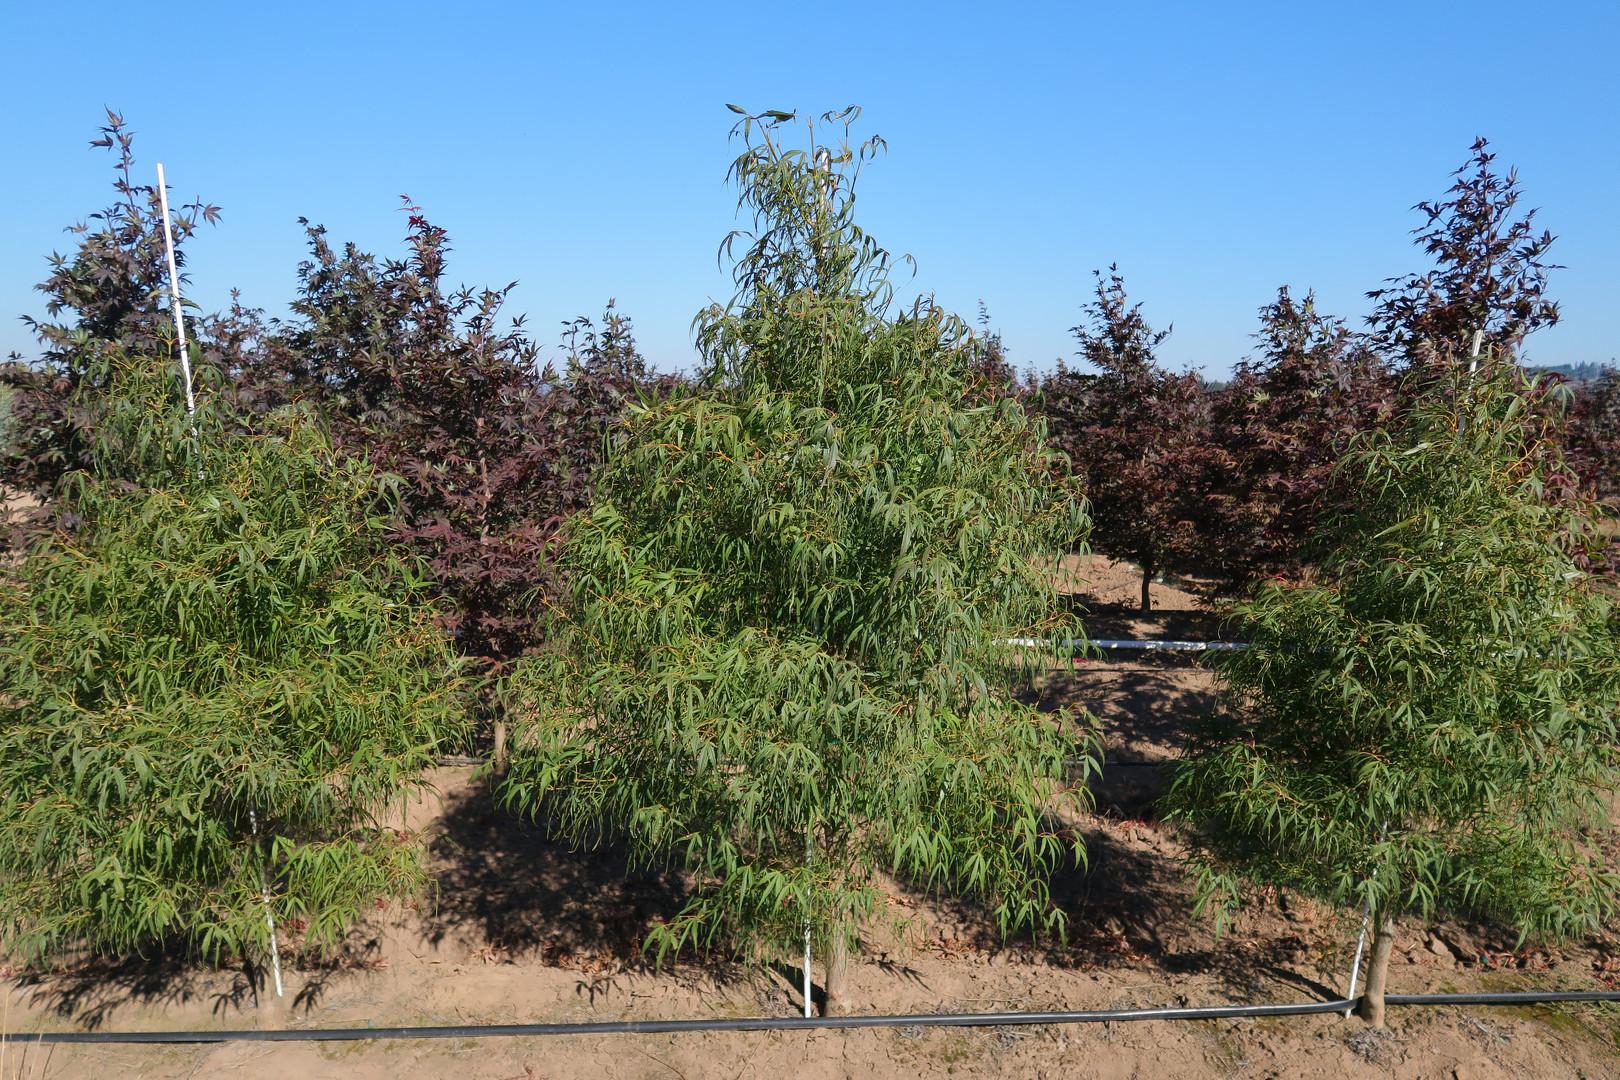 Acer palmatum 'Koto no ito'